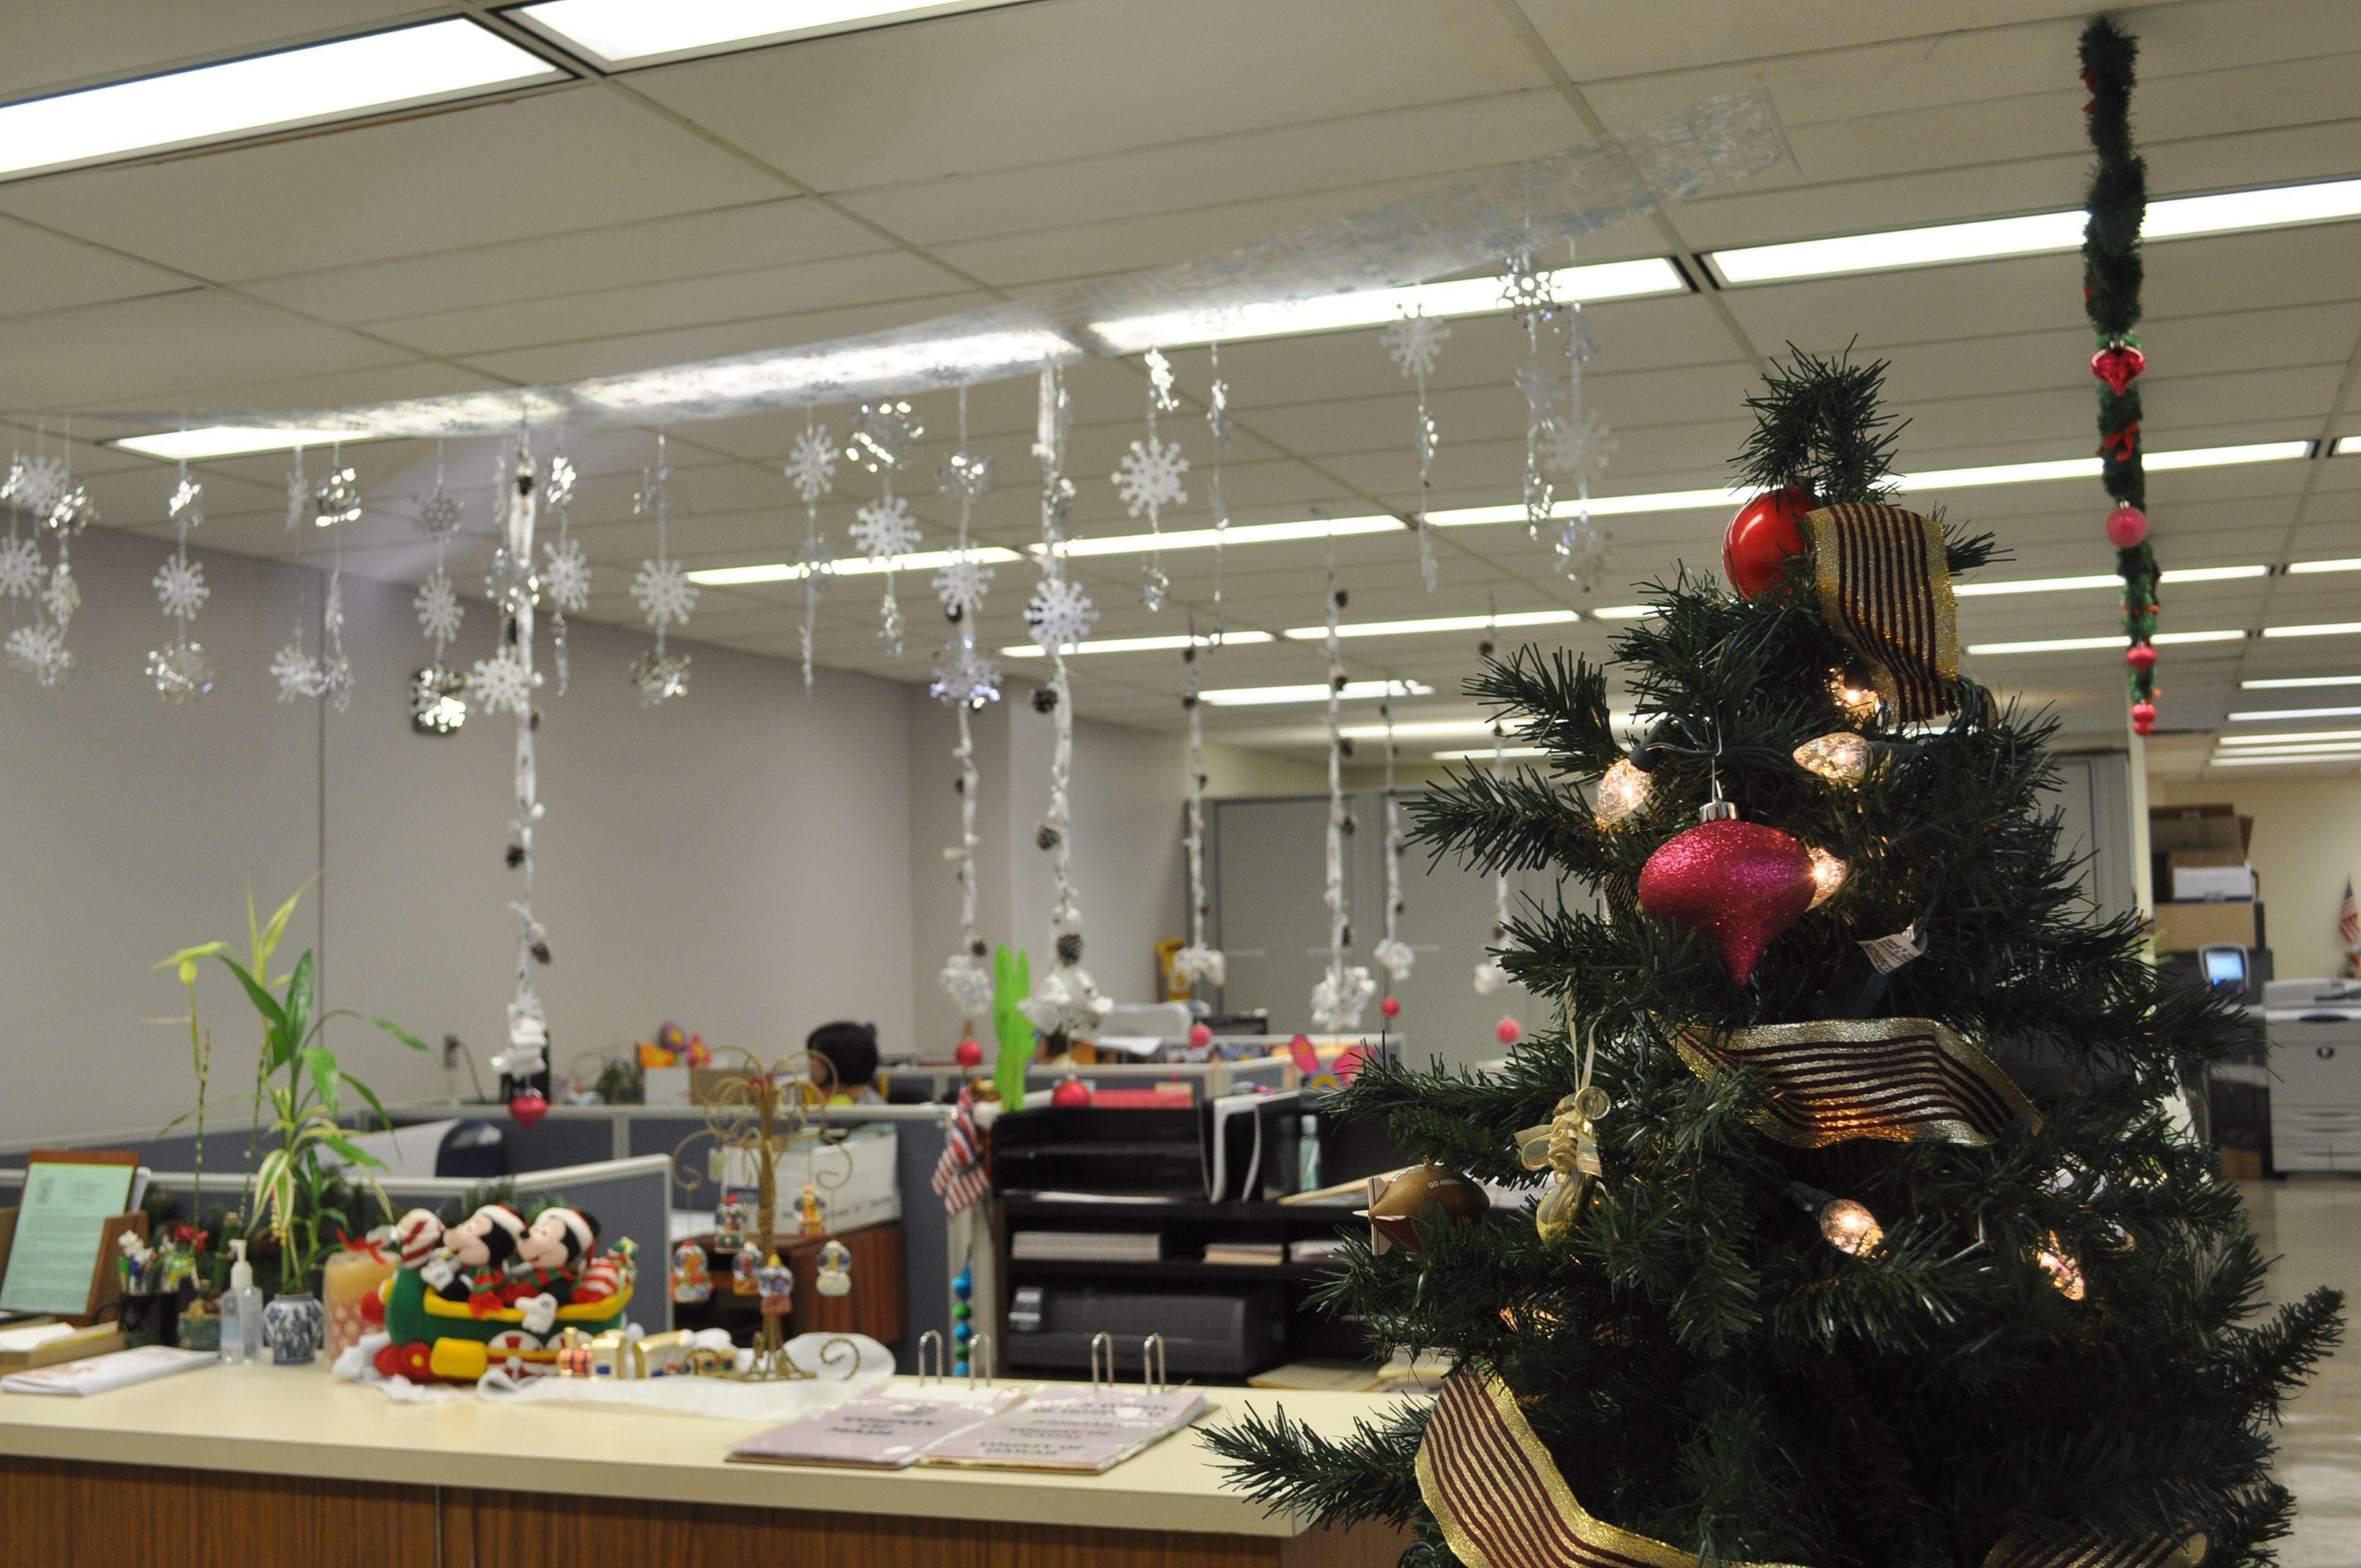 Phenomenon 30 Incredible Christmas Decor Ideas For Your fices